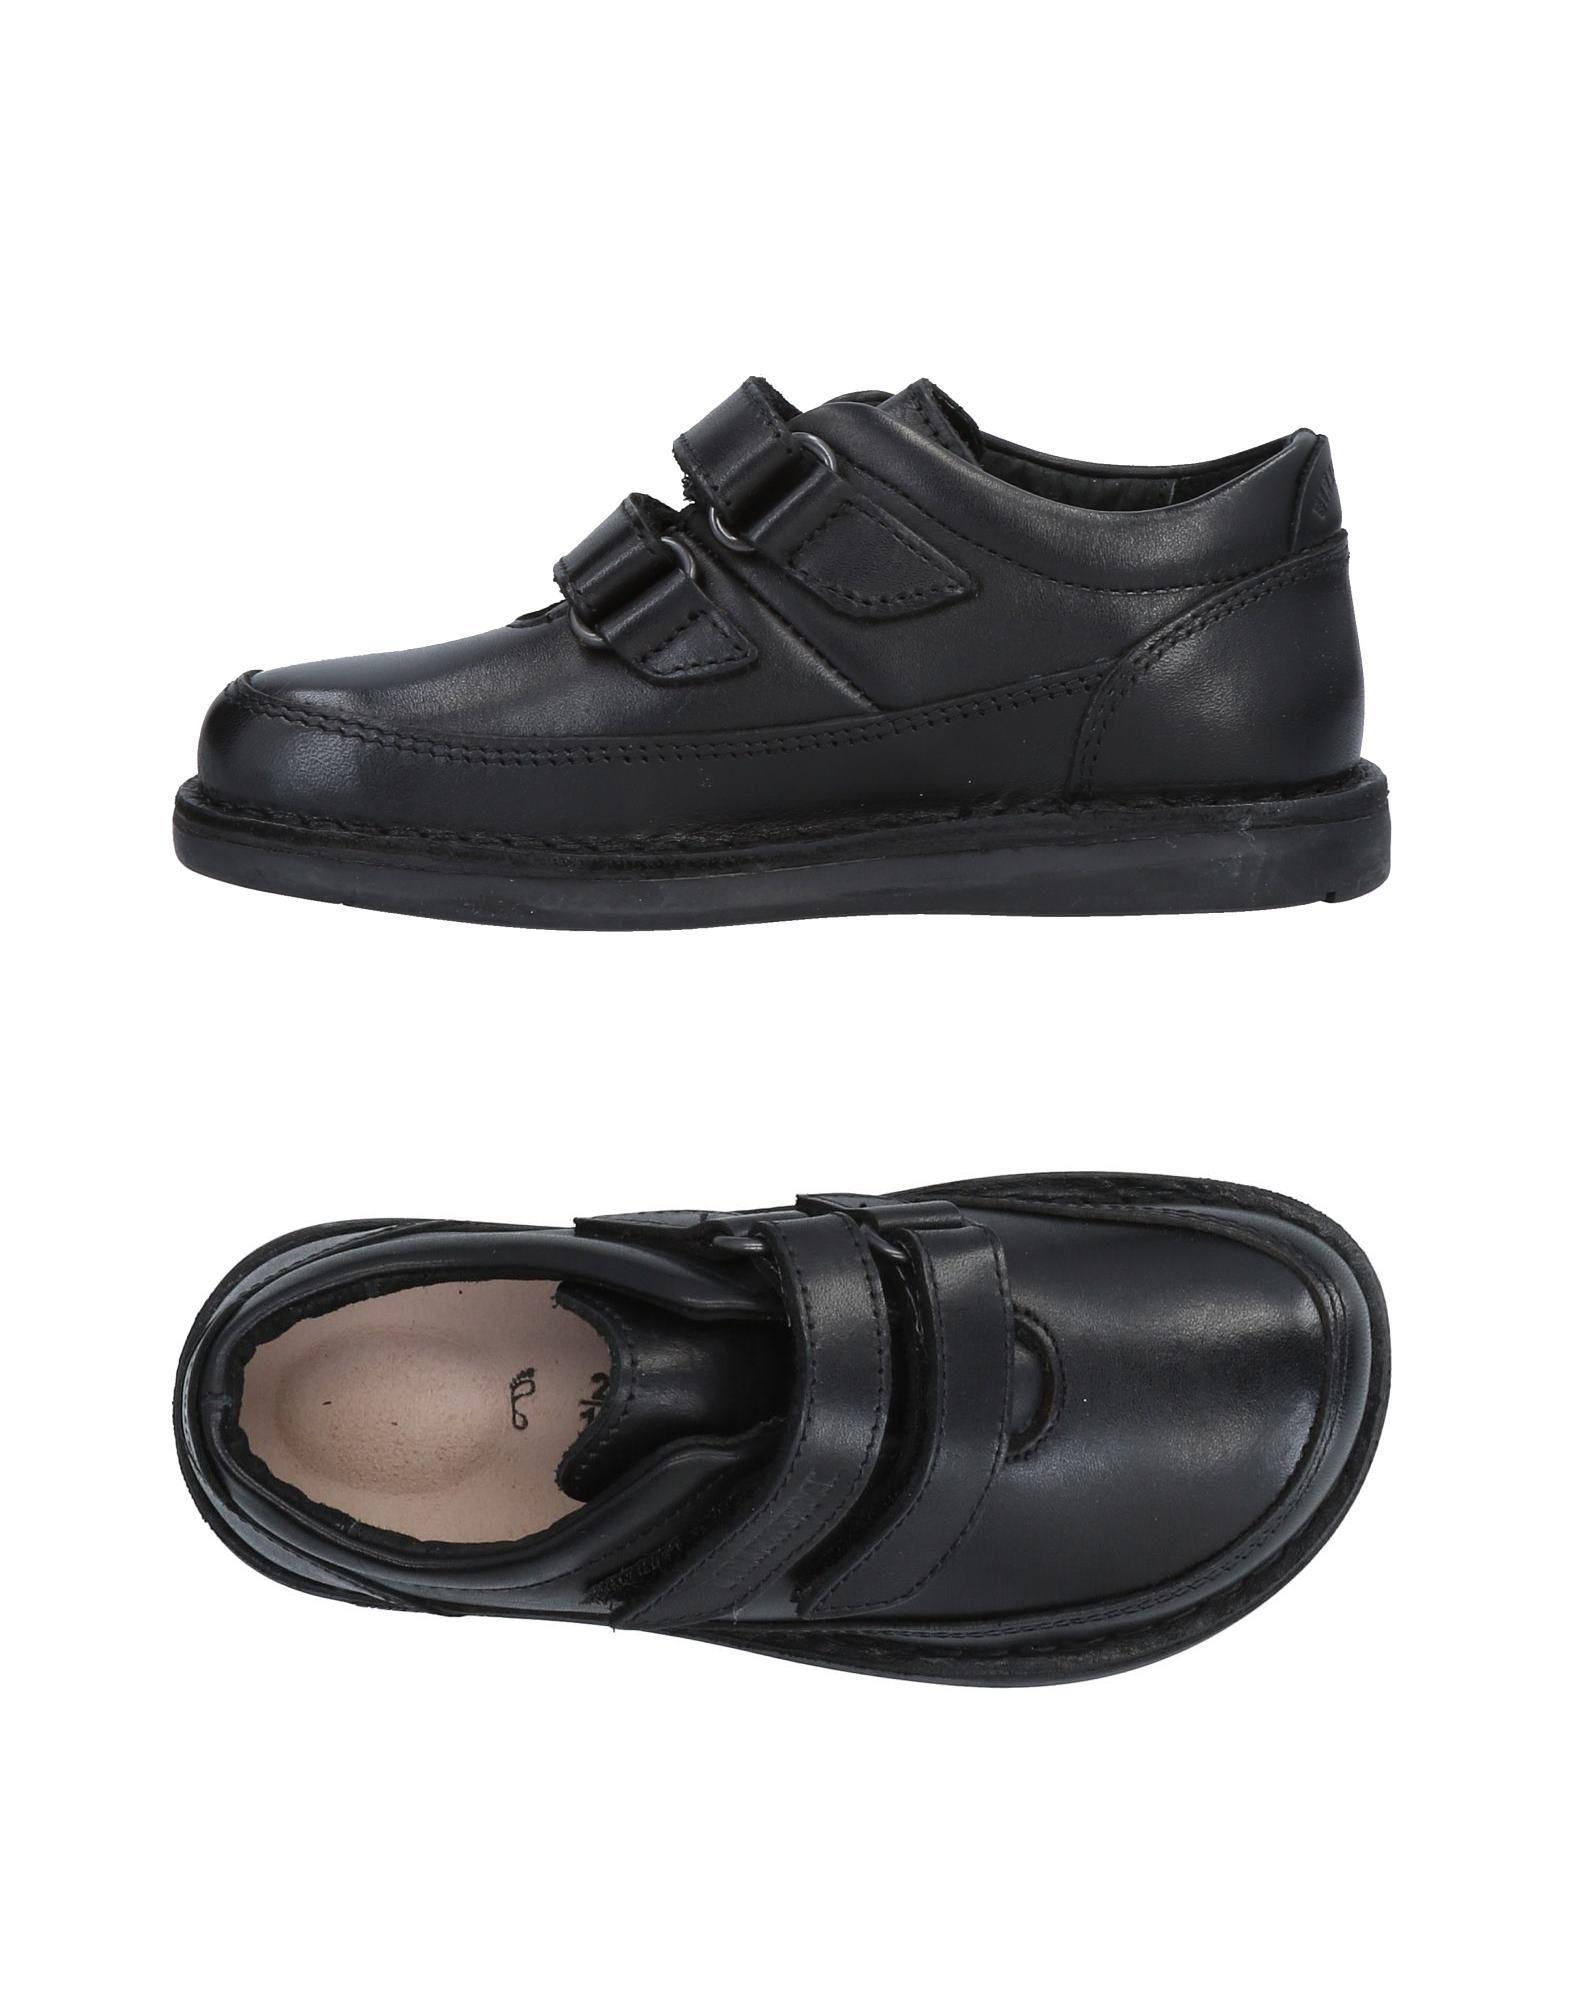 b306d1cb3264 Birkenstock Loafer in Black - Lyst